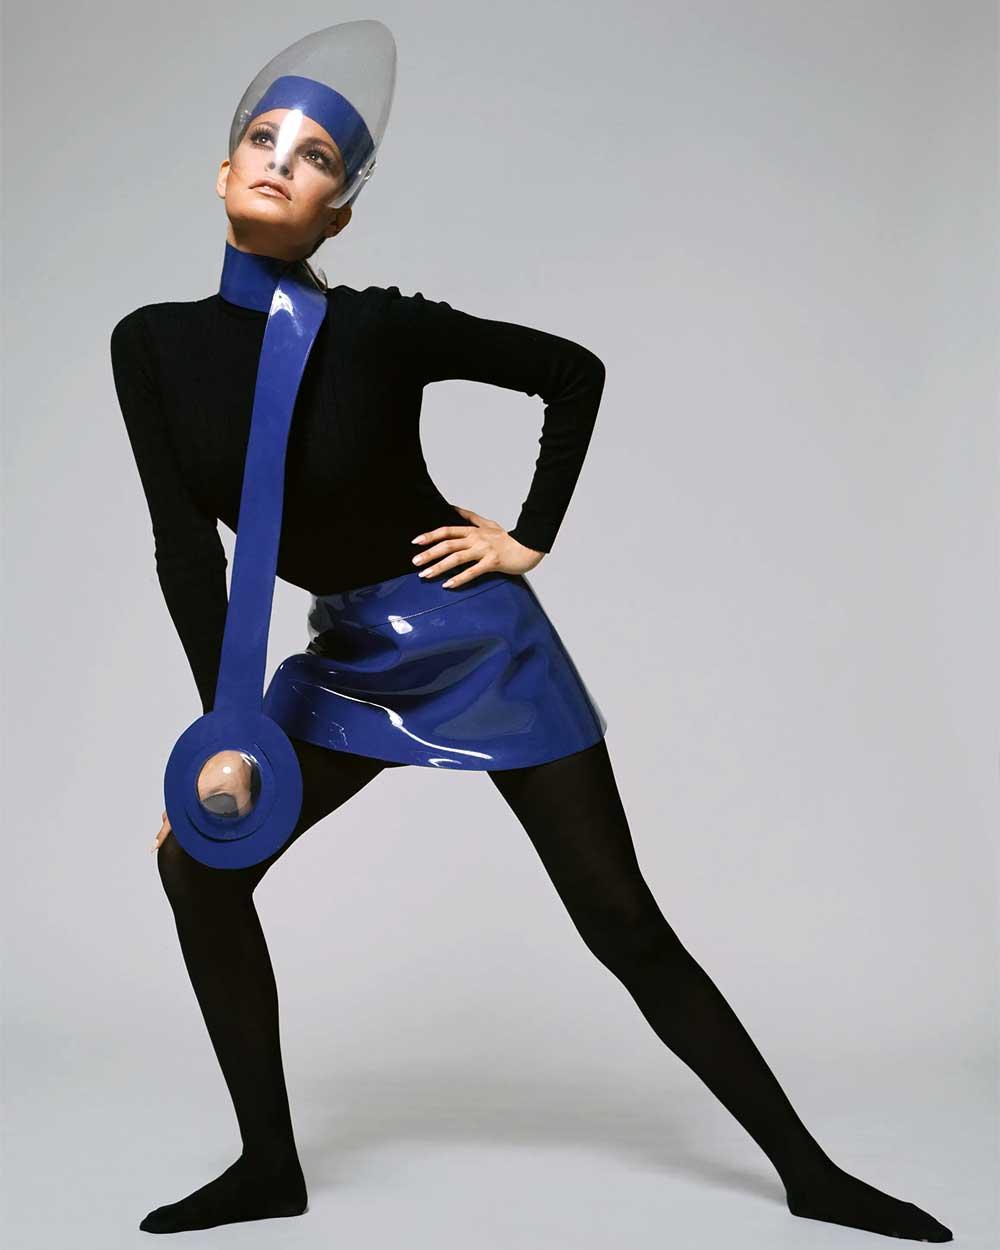 Pierre Cardin 1964 retro futurism collection